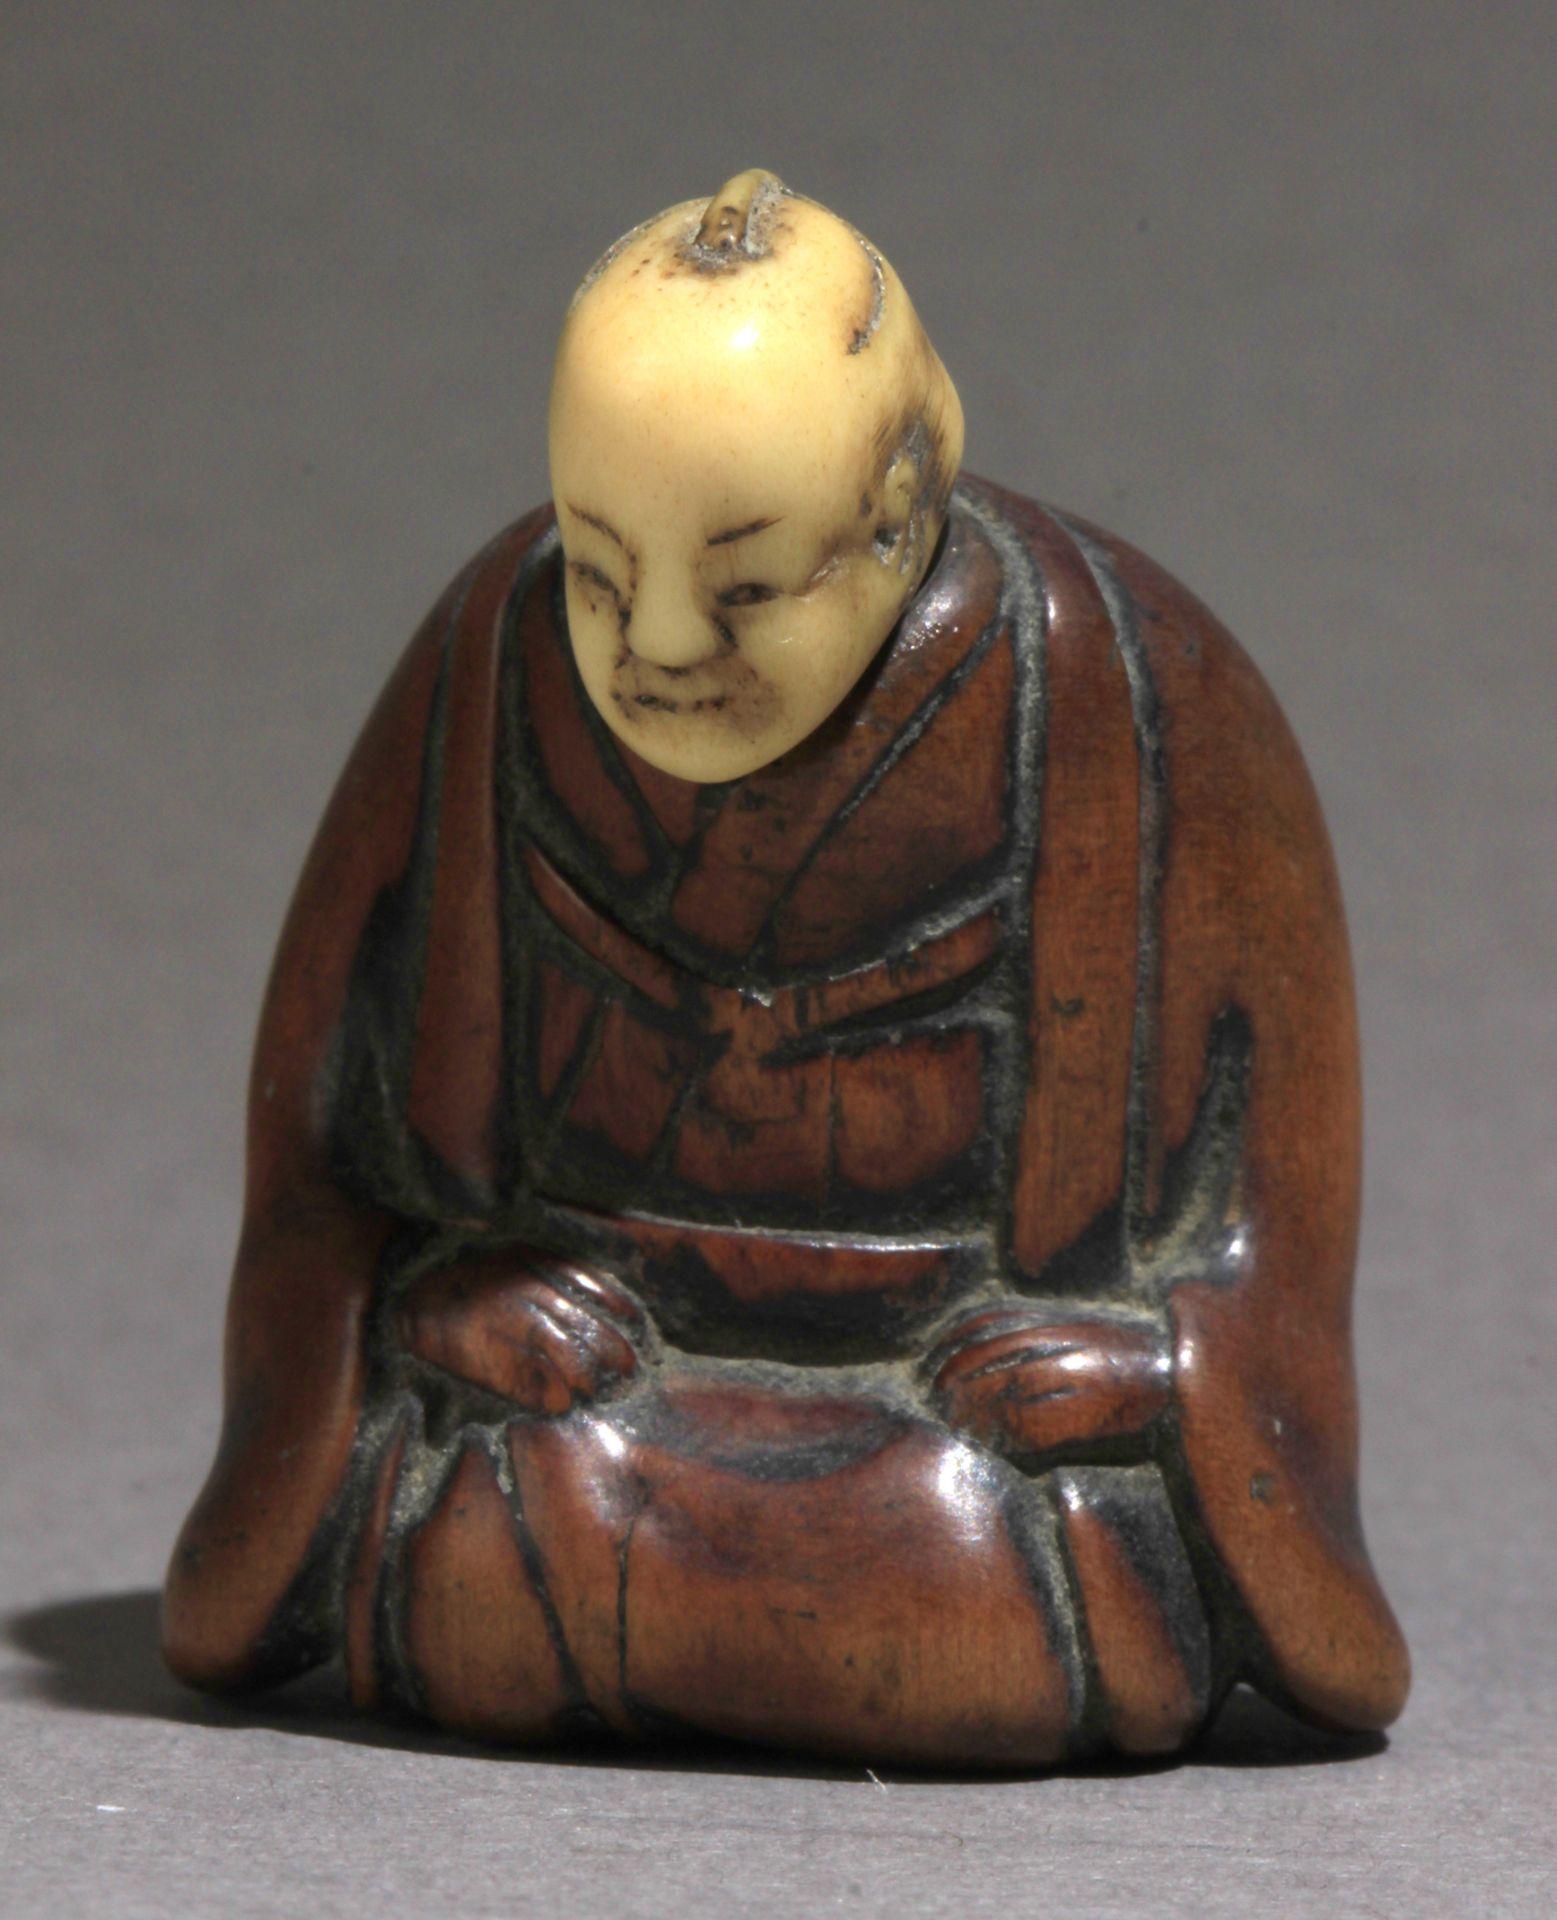 A 19th century Japanese netsuke from Edo period